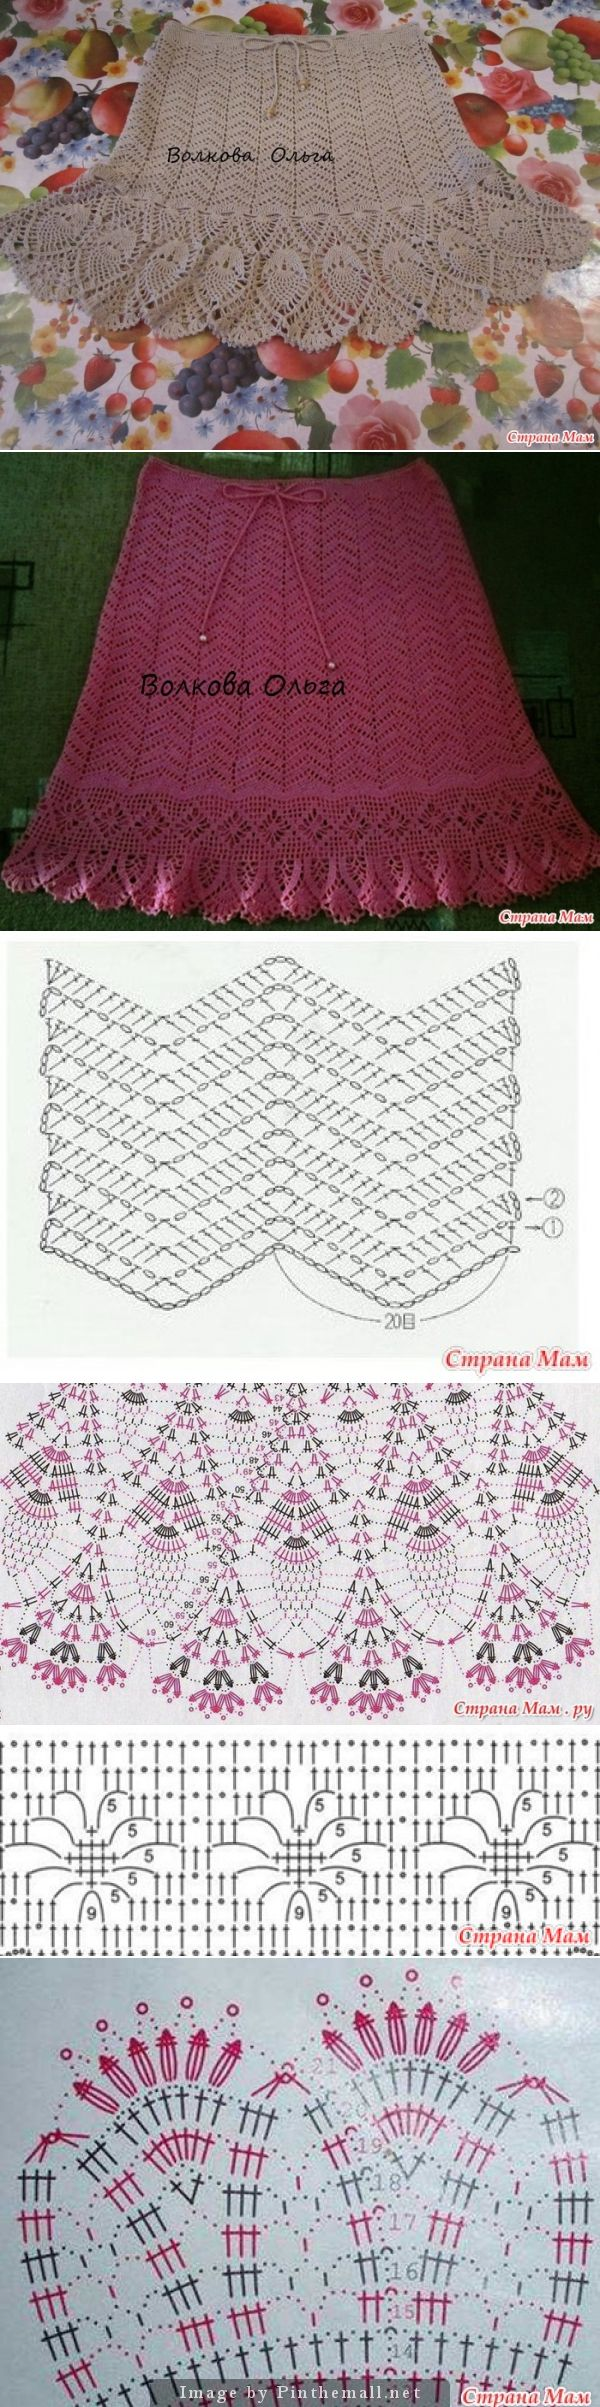 Crochet Skirt -  ou  Saia de Crochê ----